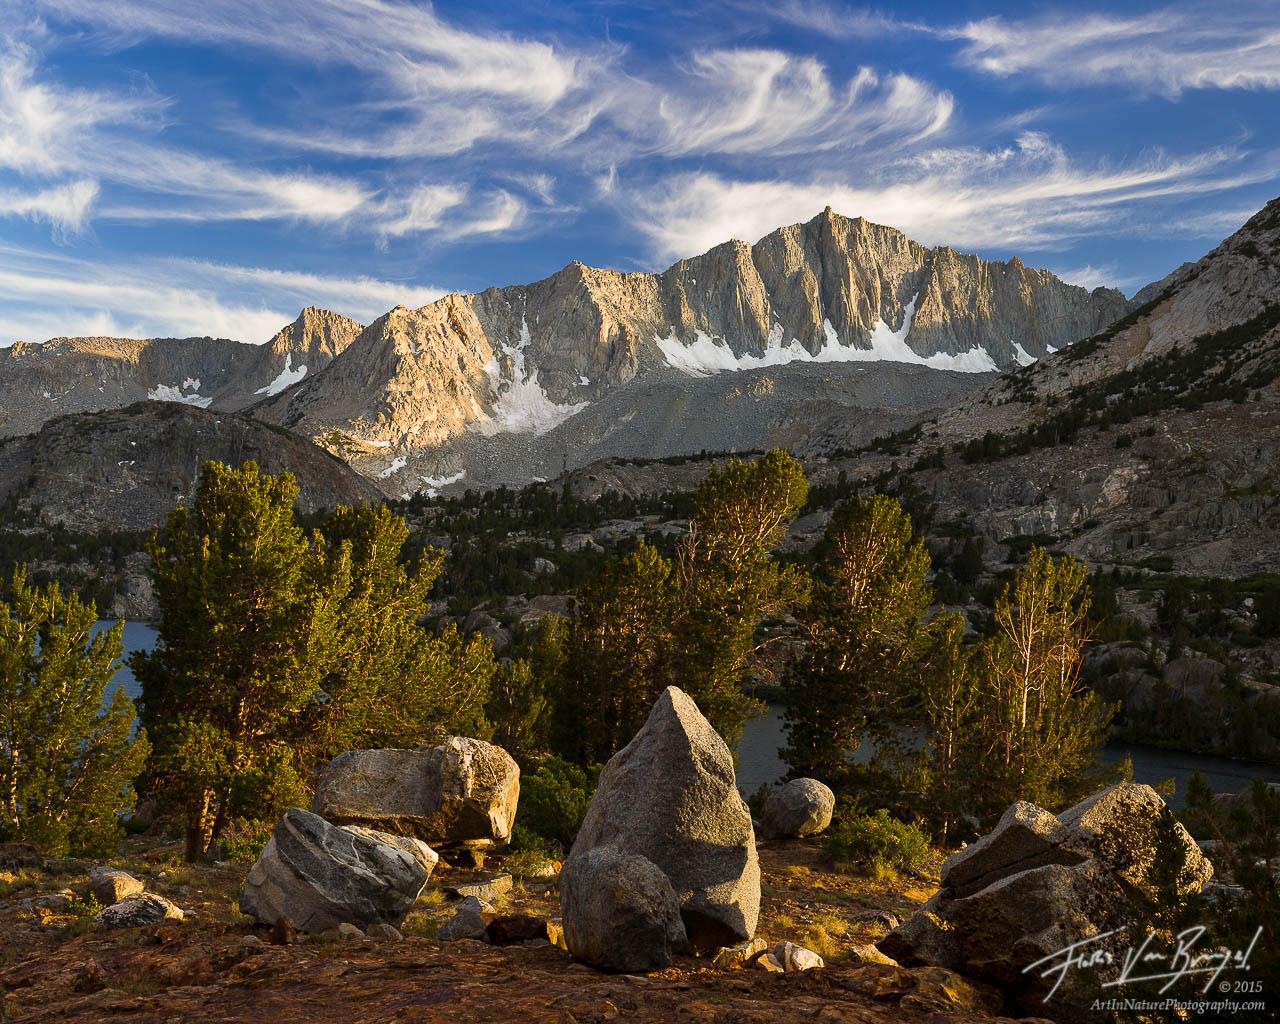 Mount Goode at Sunset in the Sierra, Kings Canyon National Park, California, golden sierra,, photo